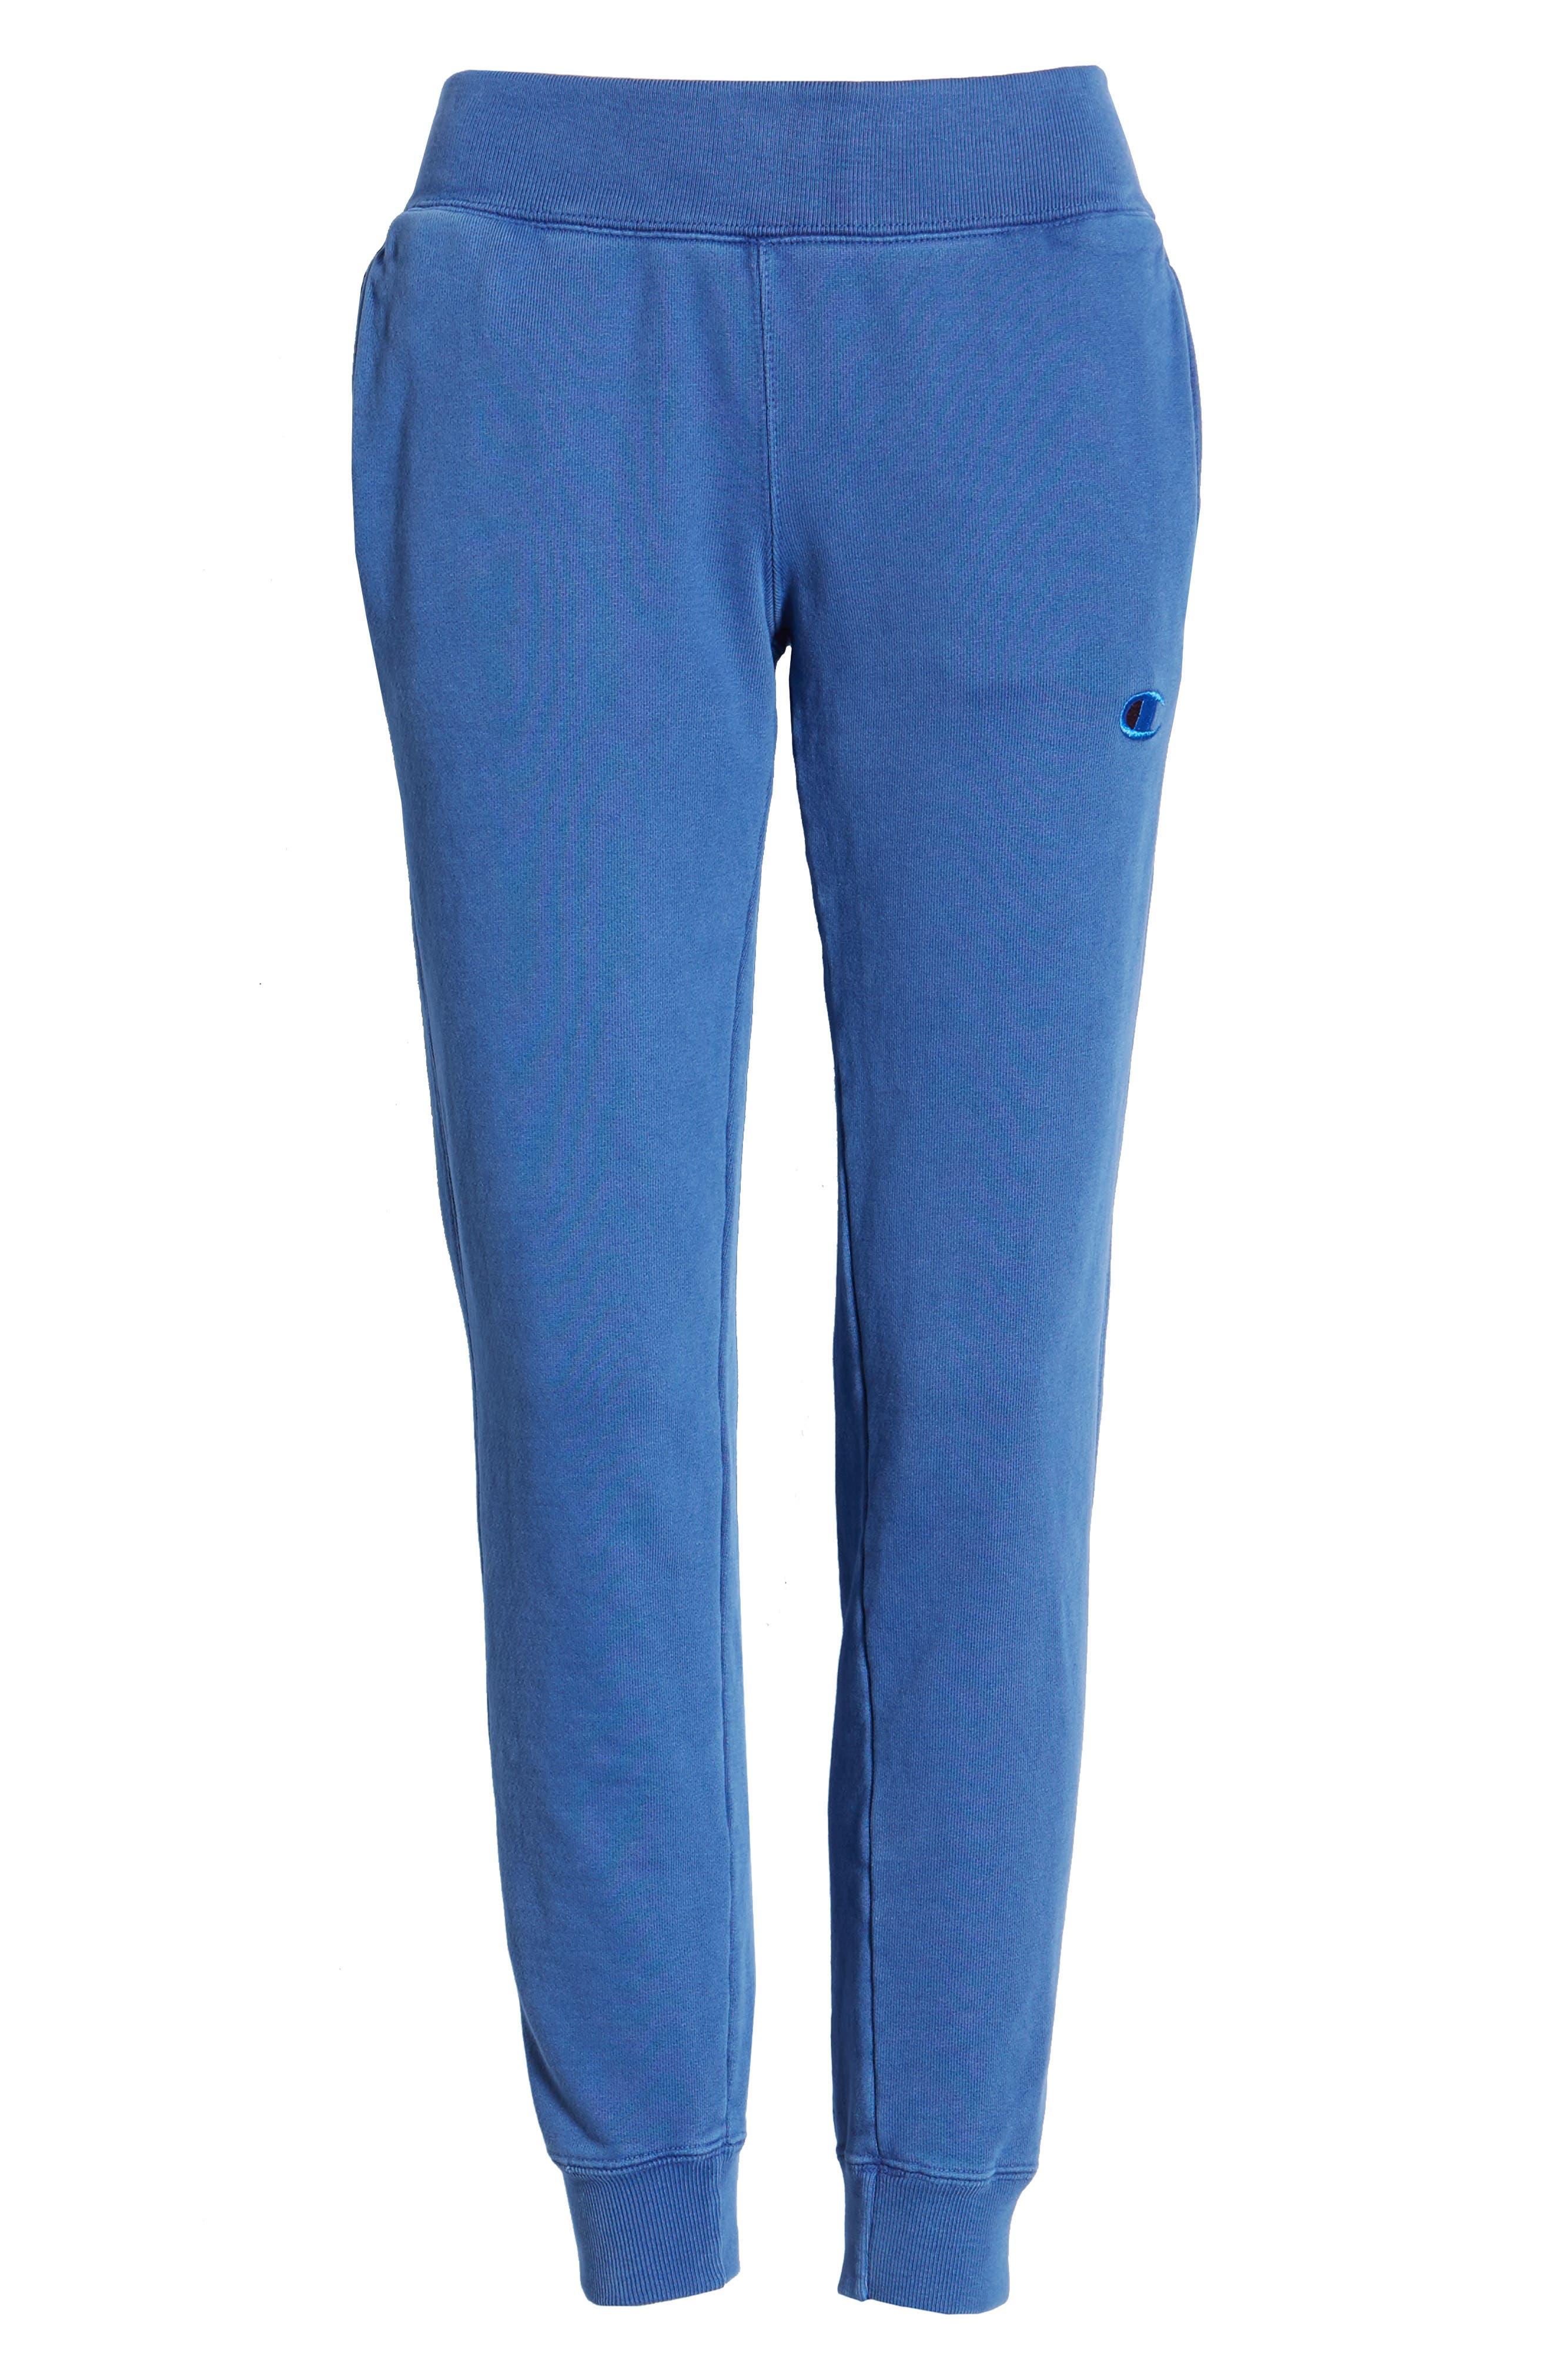 Garment Dyed Jogger Pants,                             Alternate thumbnail 7, color,                             SURF THE WEB